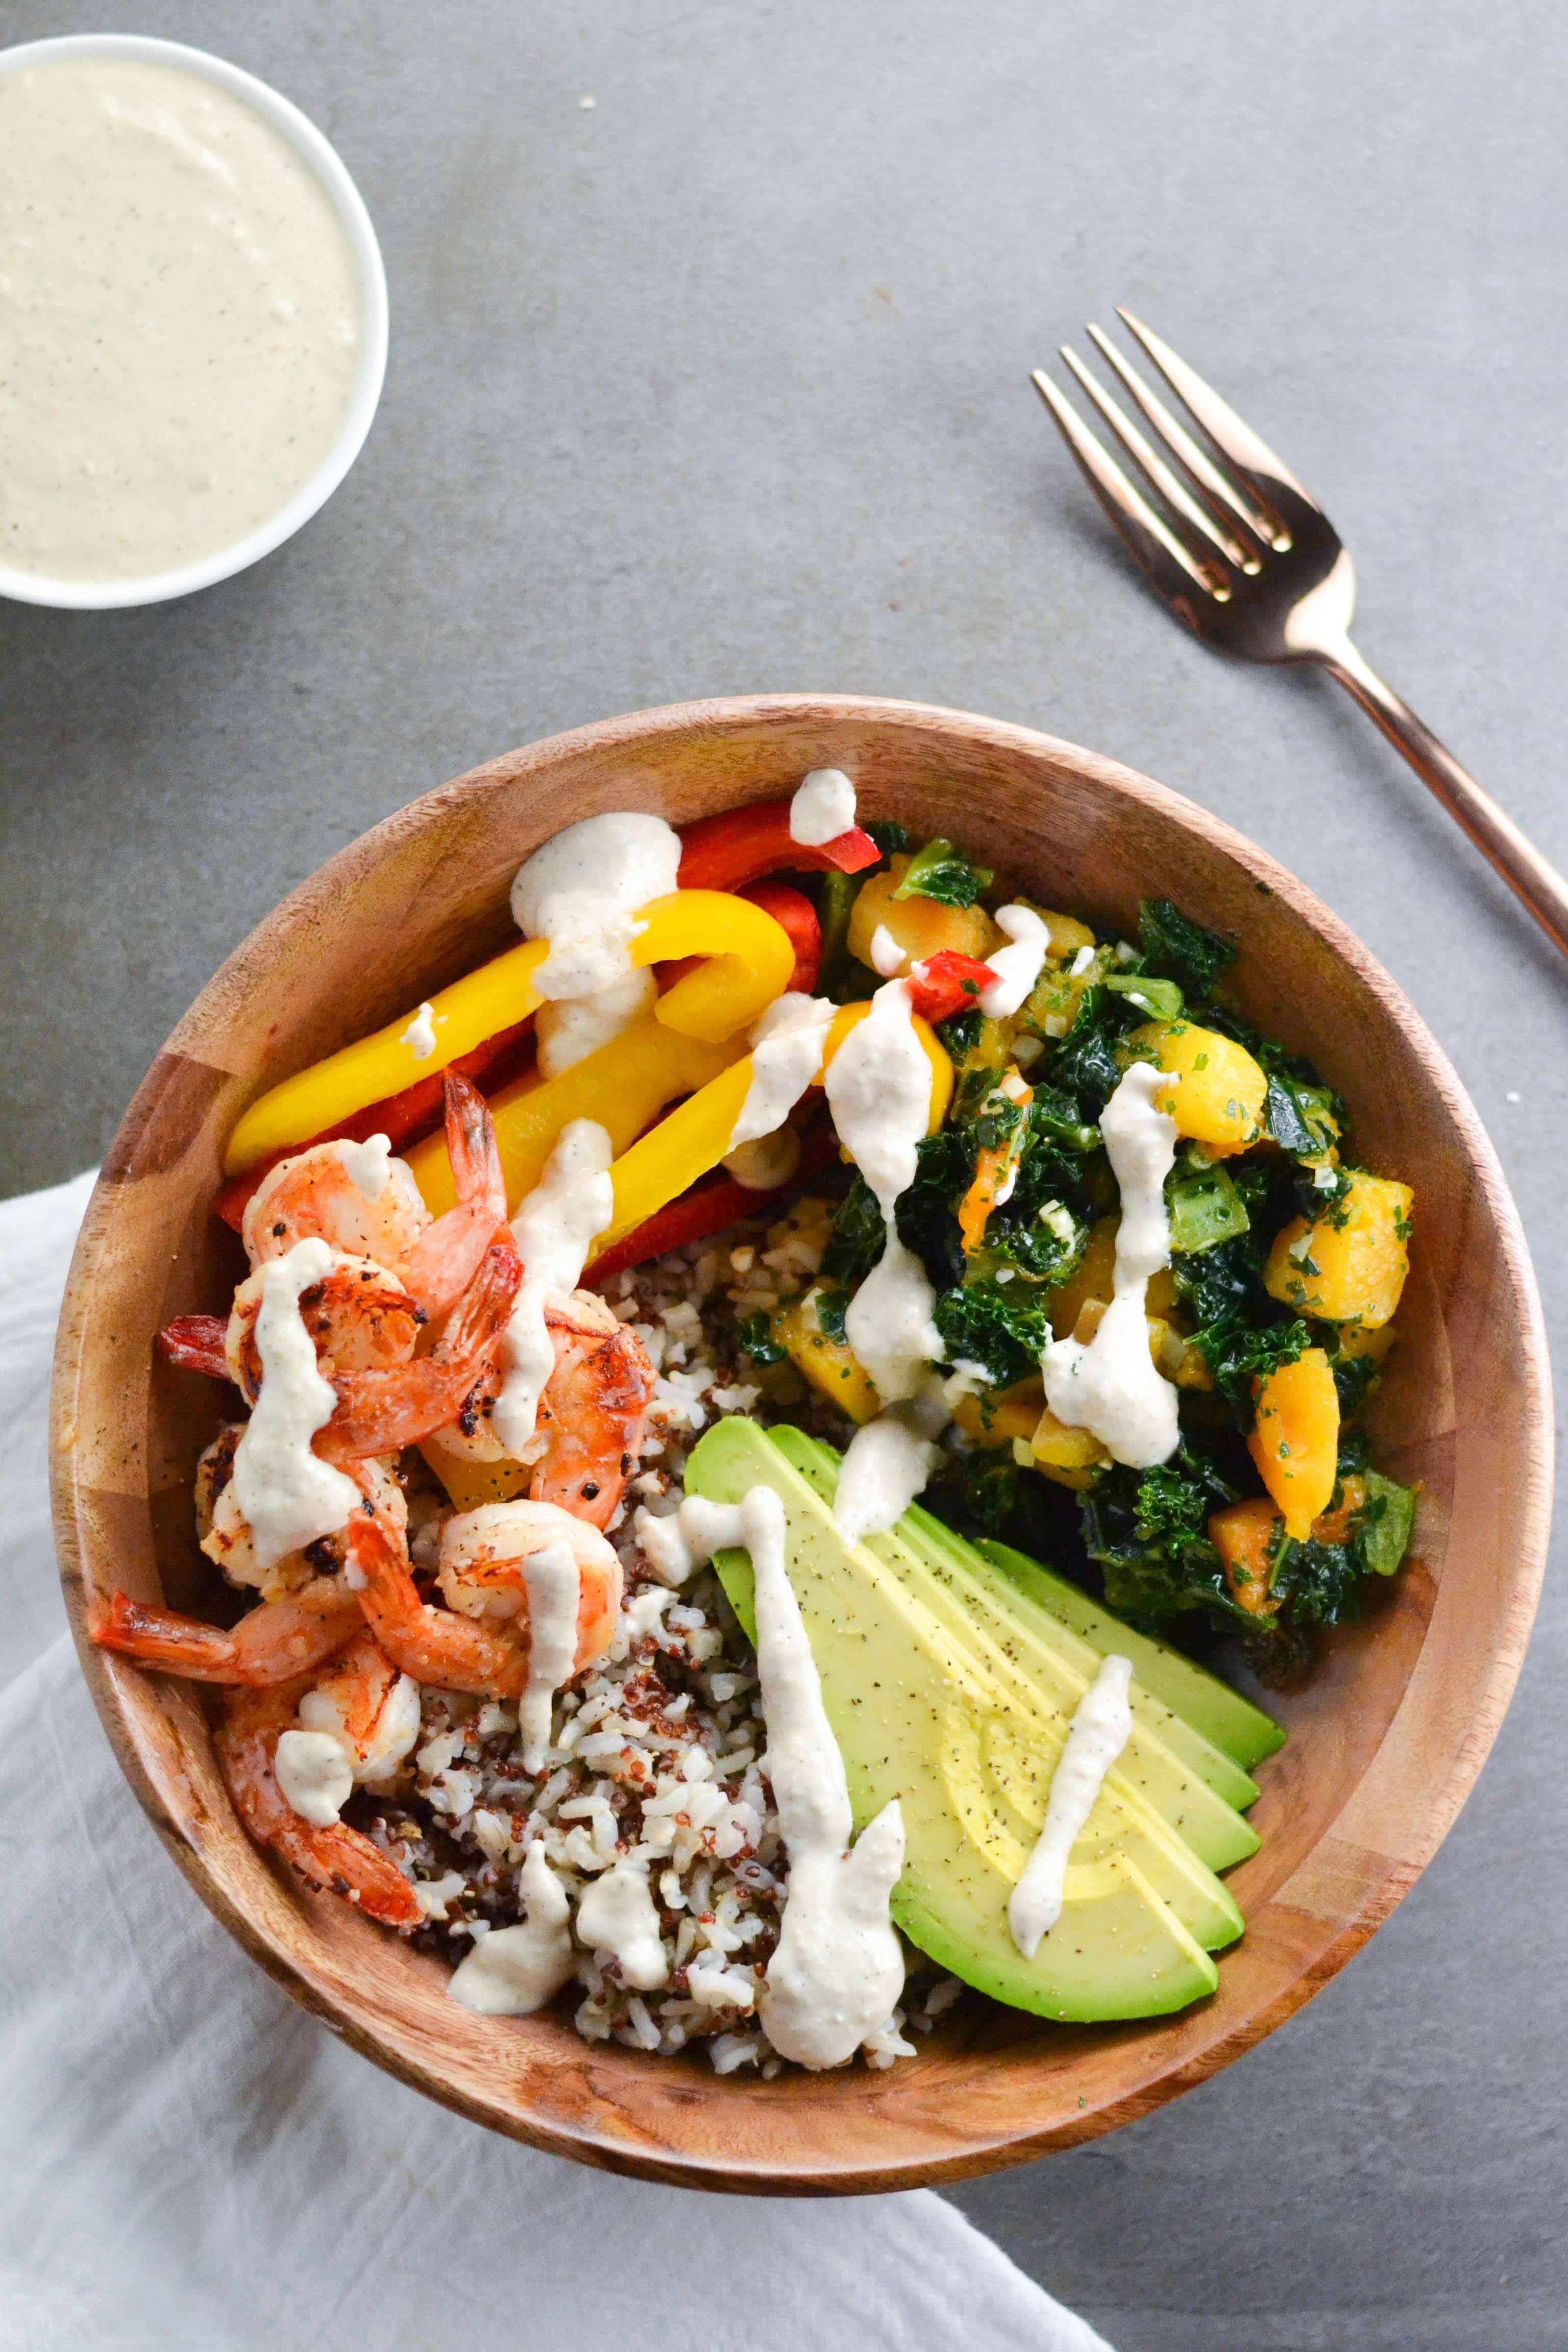 Shrimp Grain Bowl with Creamy Cashew Sauce (GF, DF) - A Dash of Megnut